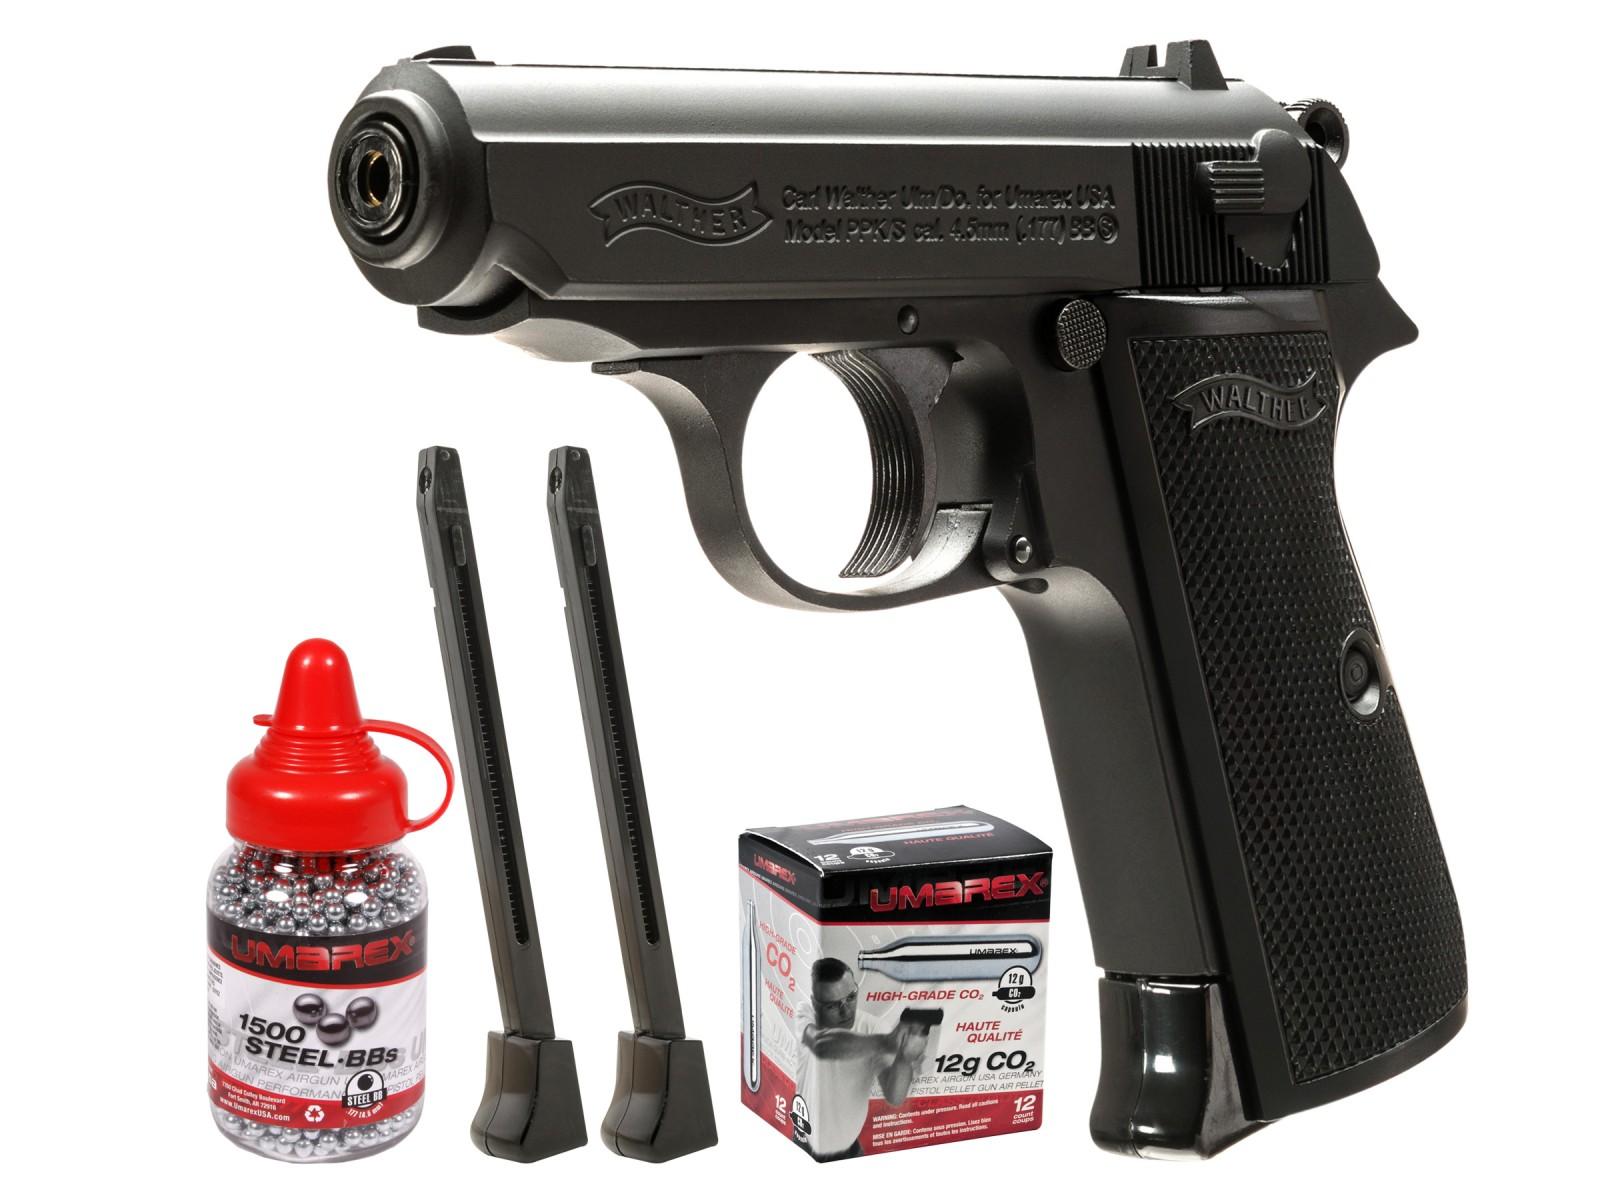 walther legends ppk s black bb pistol kit air guns pyramyd air rh pyramydair com Walther PPK Pistol James Bond with Walther PPK S